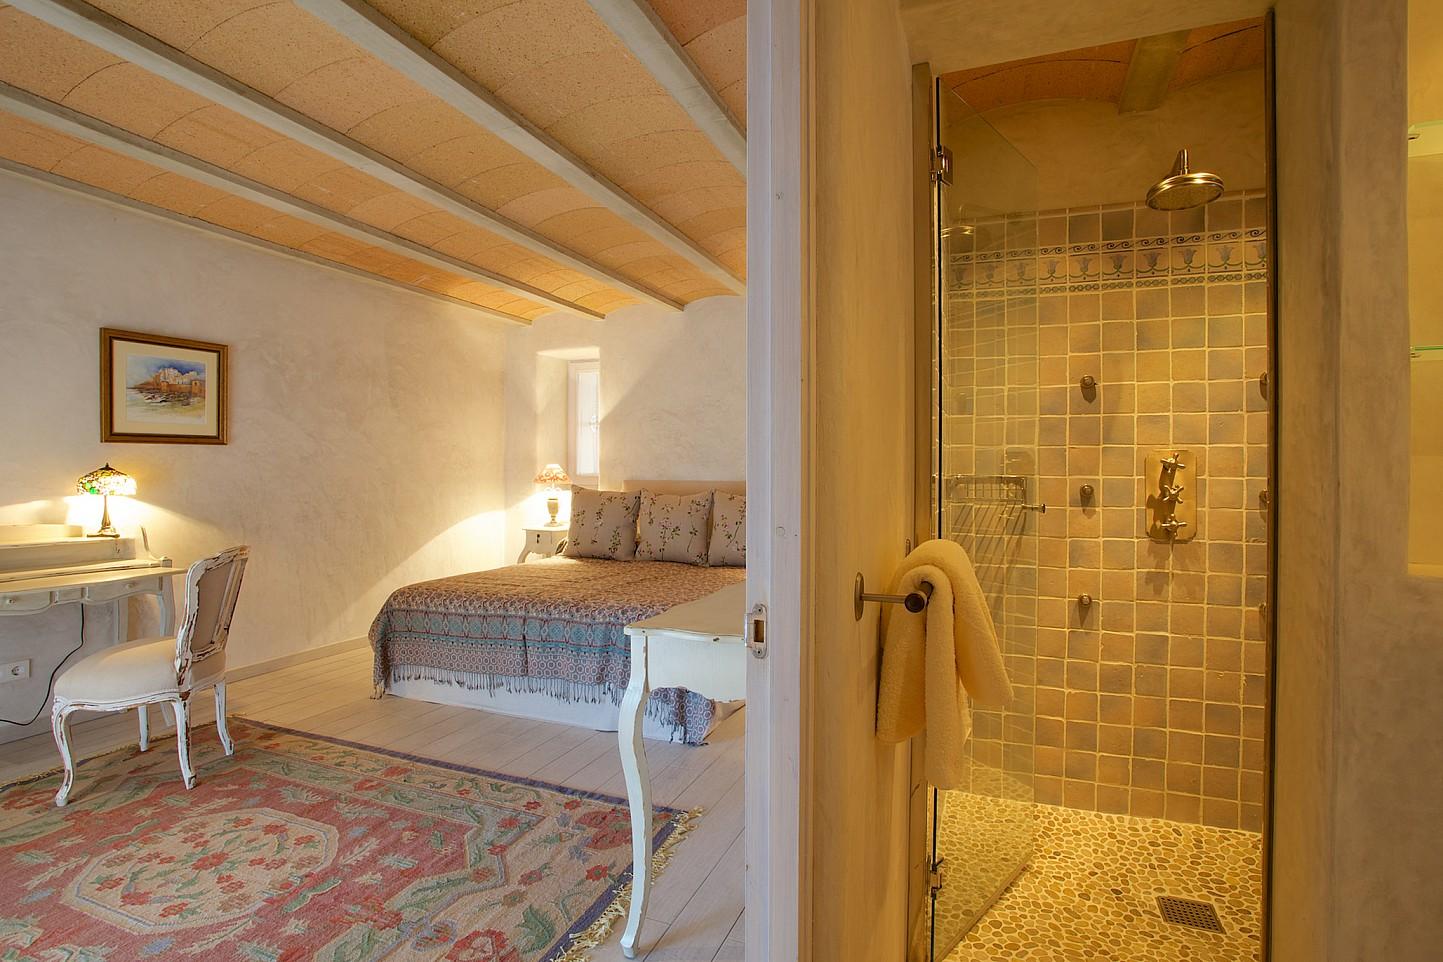 Dormitori amb dutxa separada